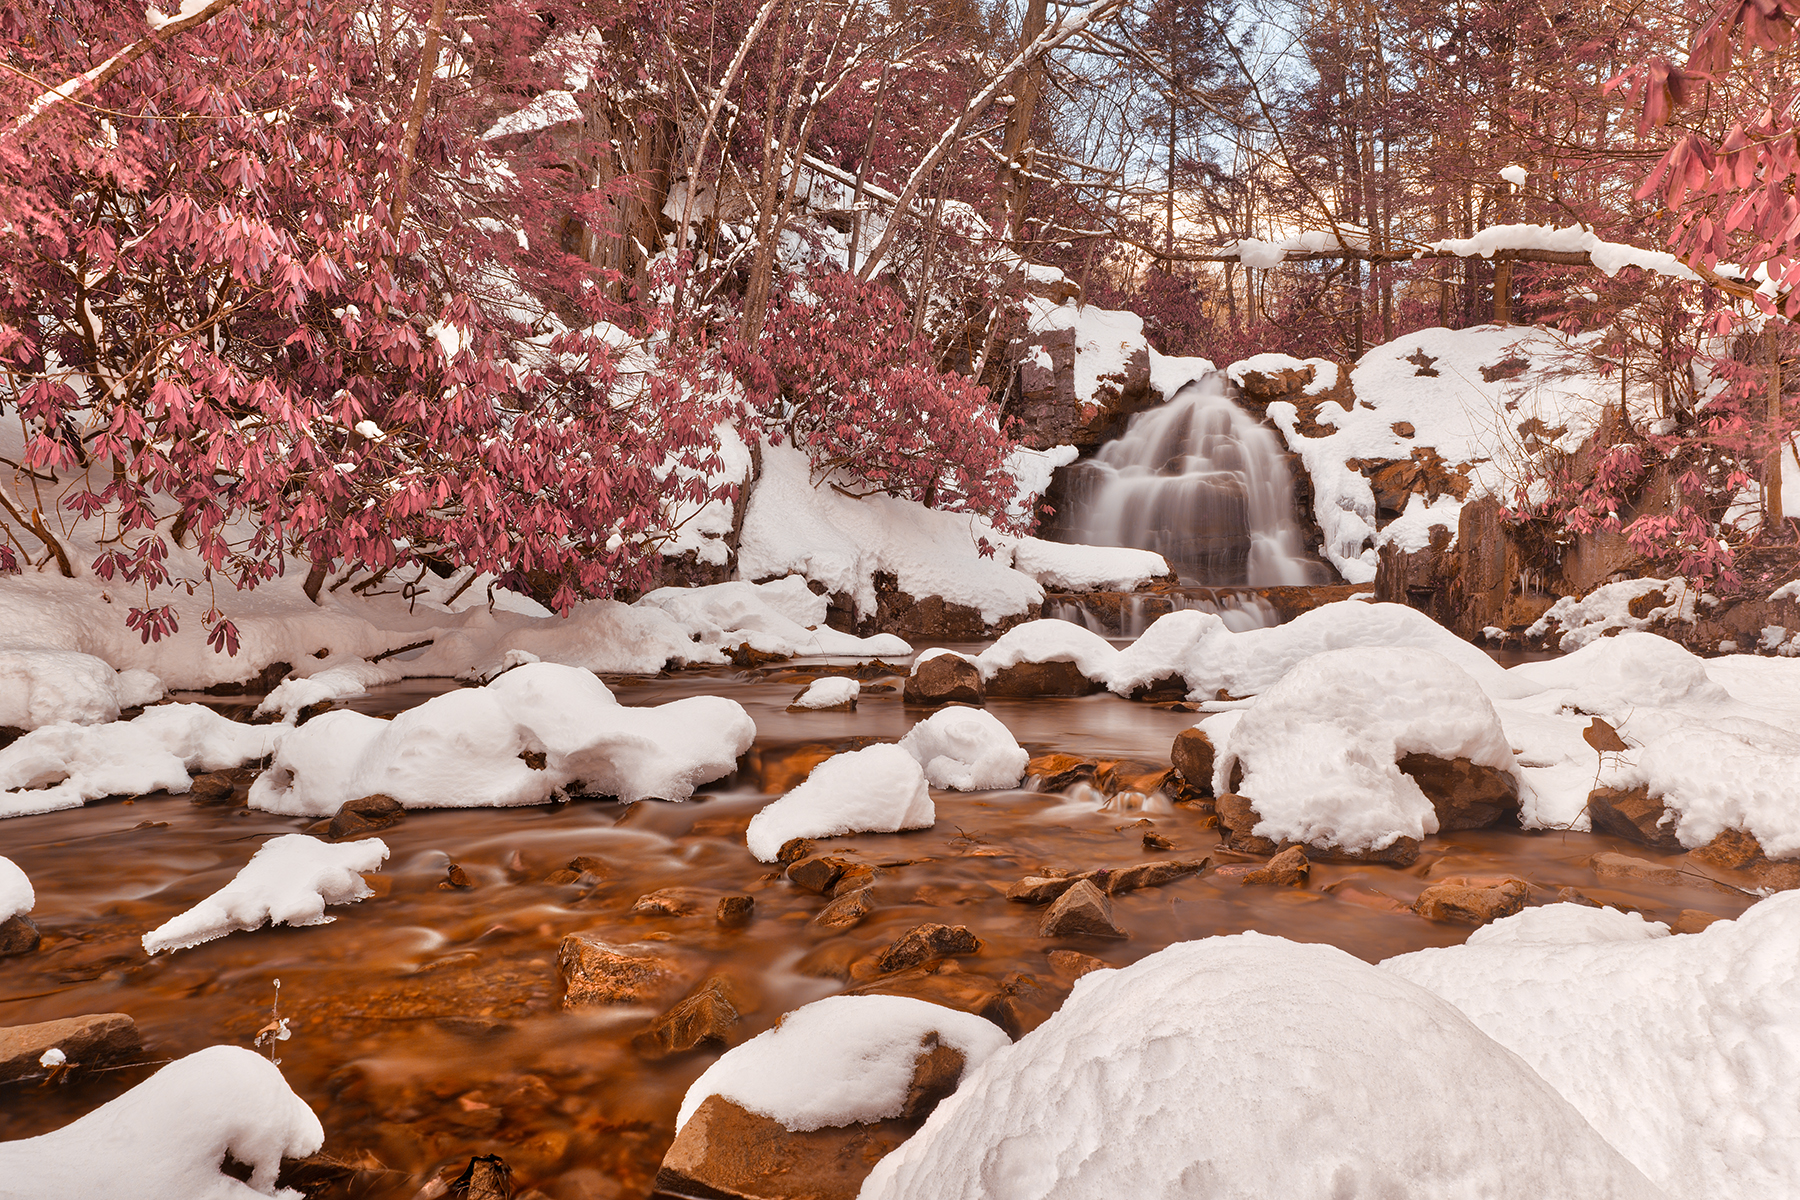 Hawk falls winter stream - pink fantasy hdr photo